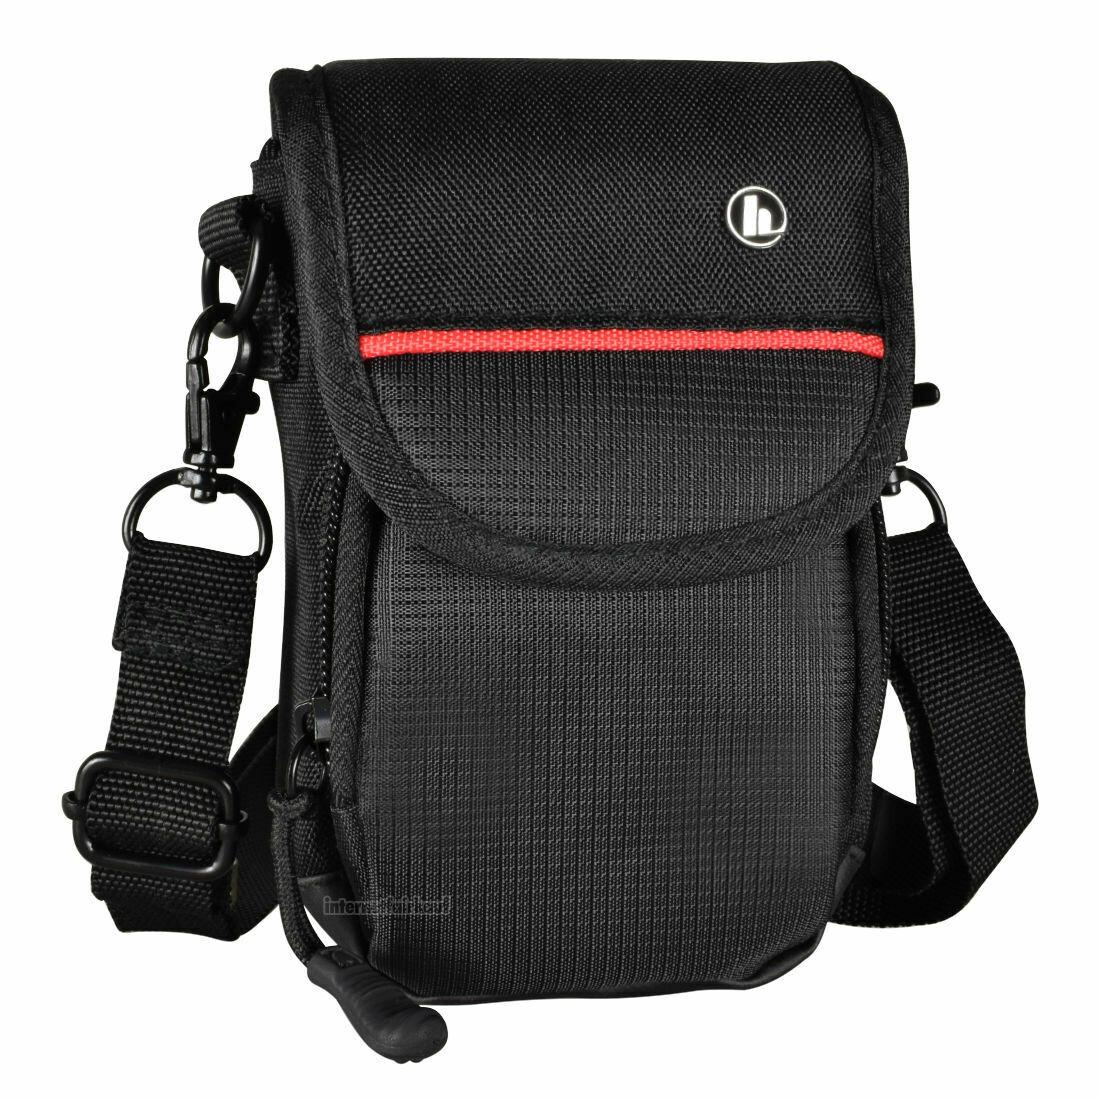 Fototasche schwarz/rot passend für Sony DSC-HX50 HX50V HX60 HX60V